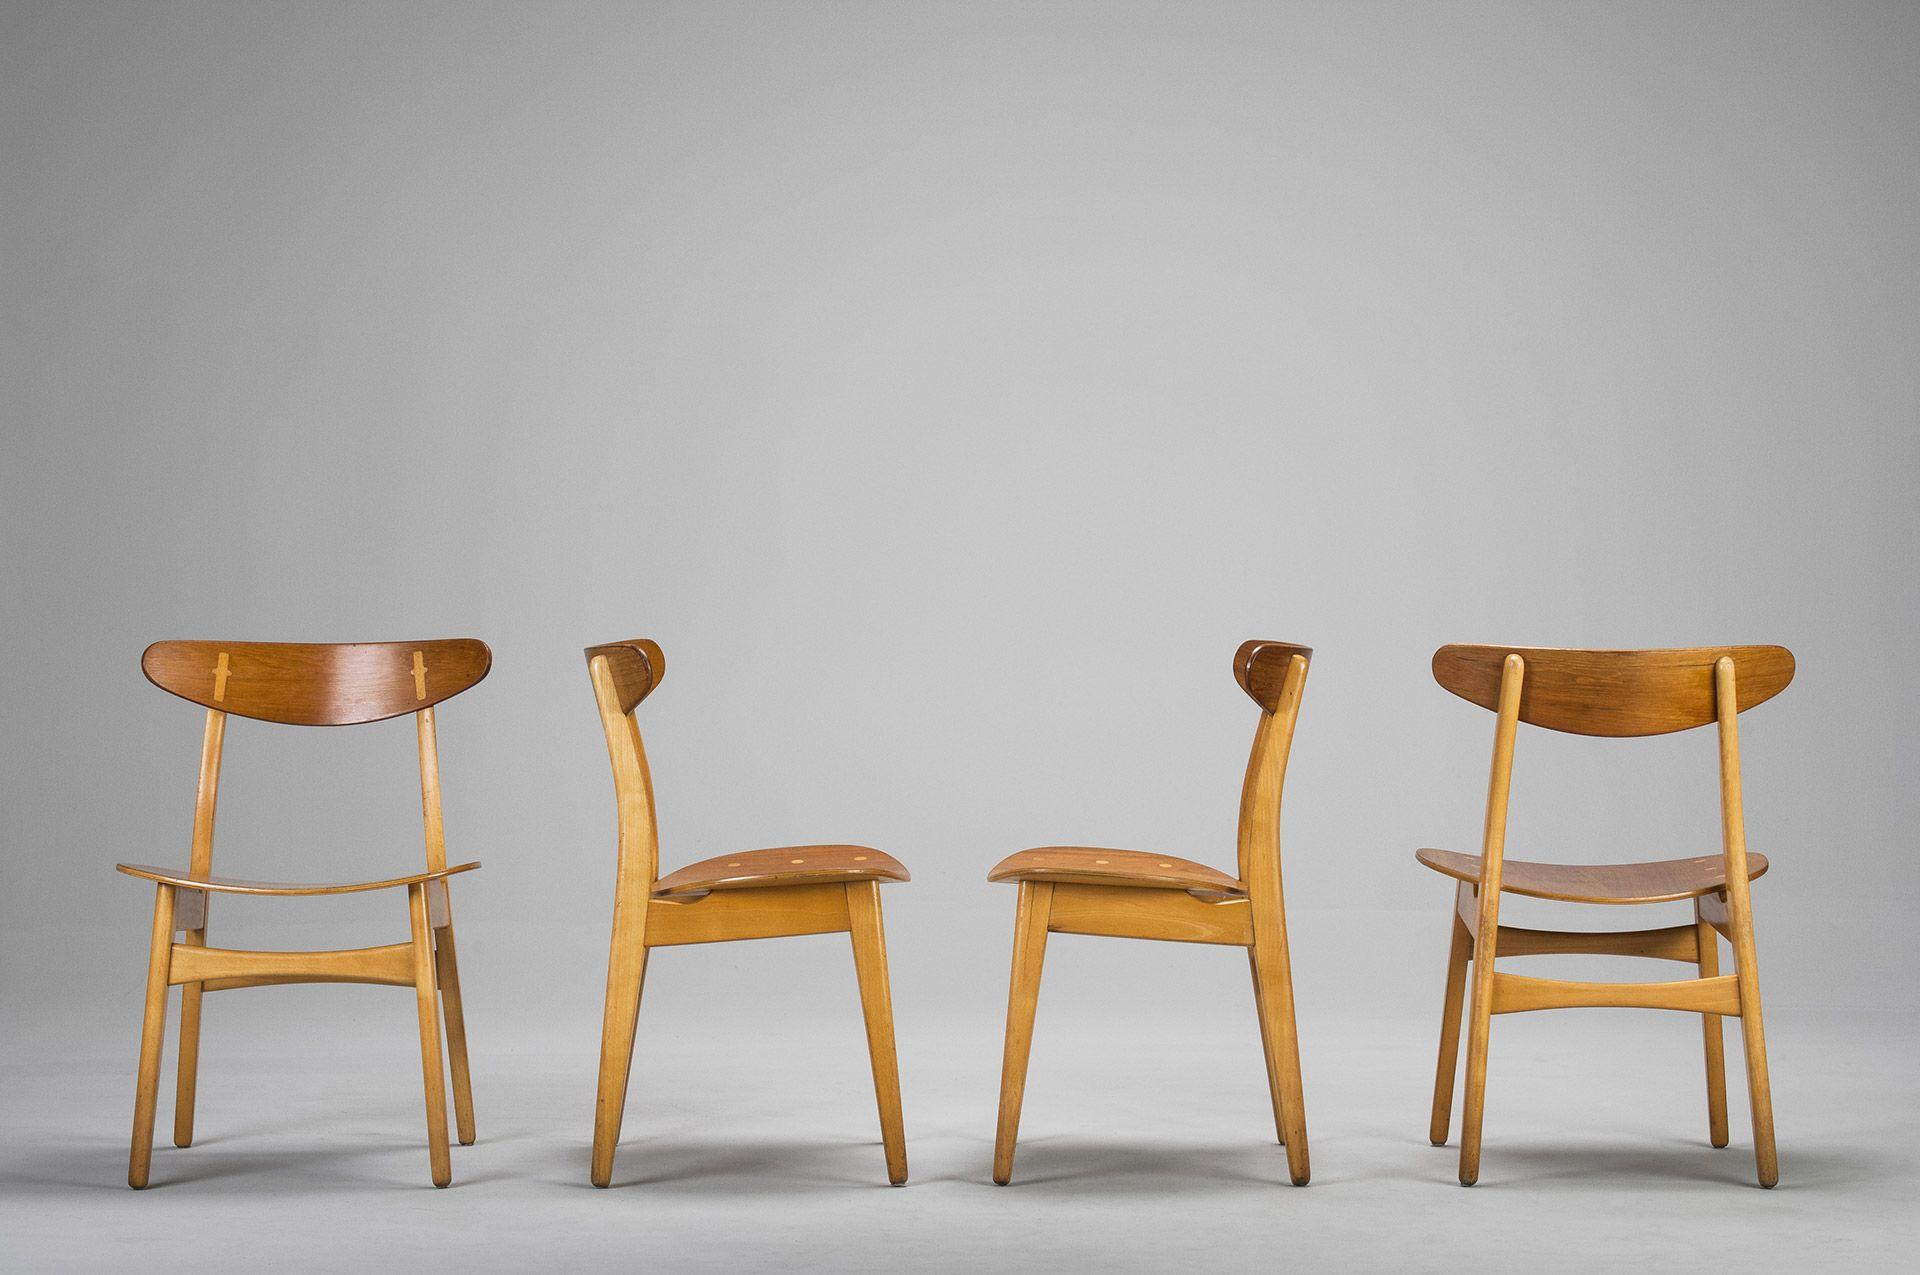 Set of four chairs studio pinterest